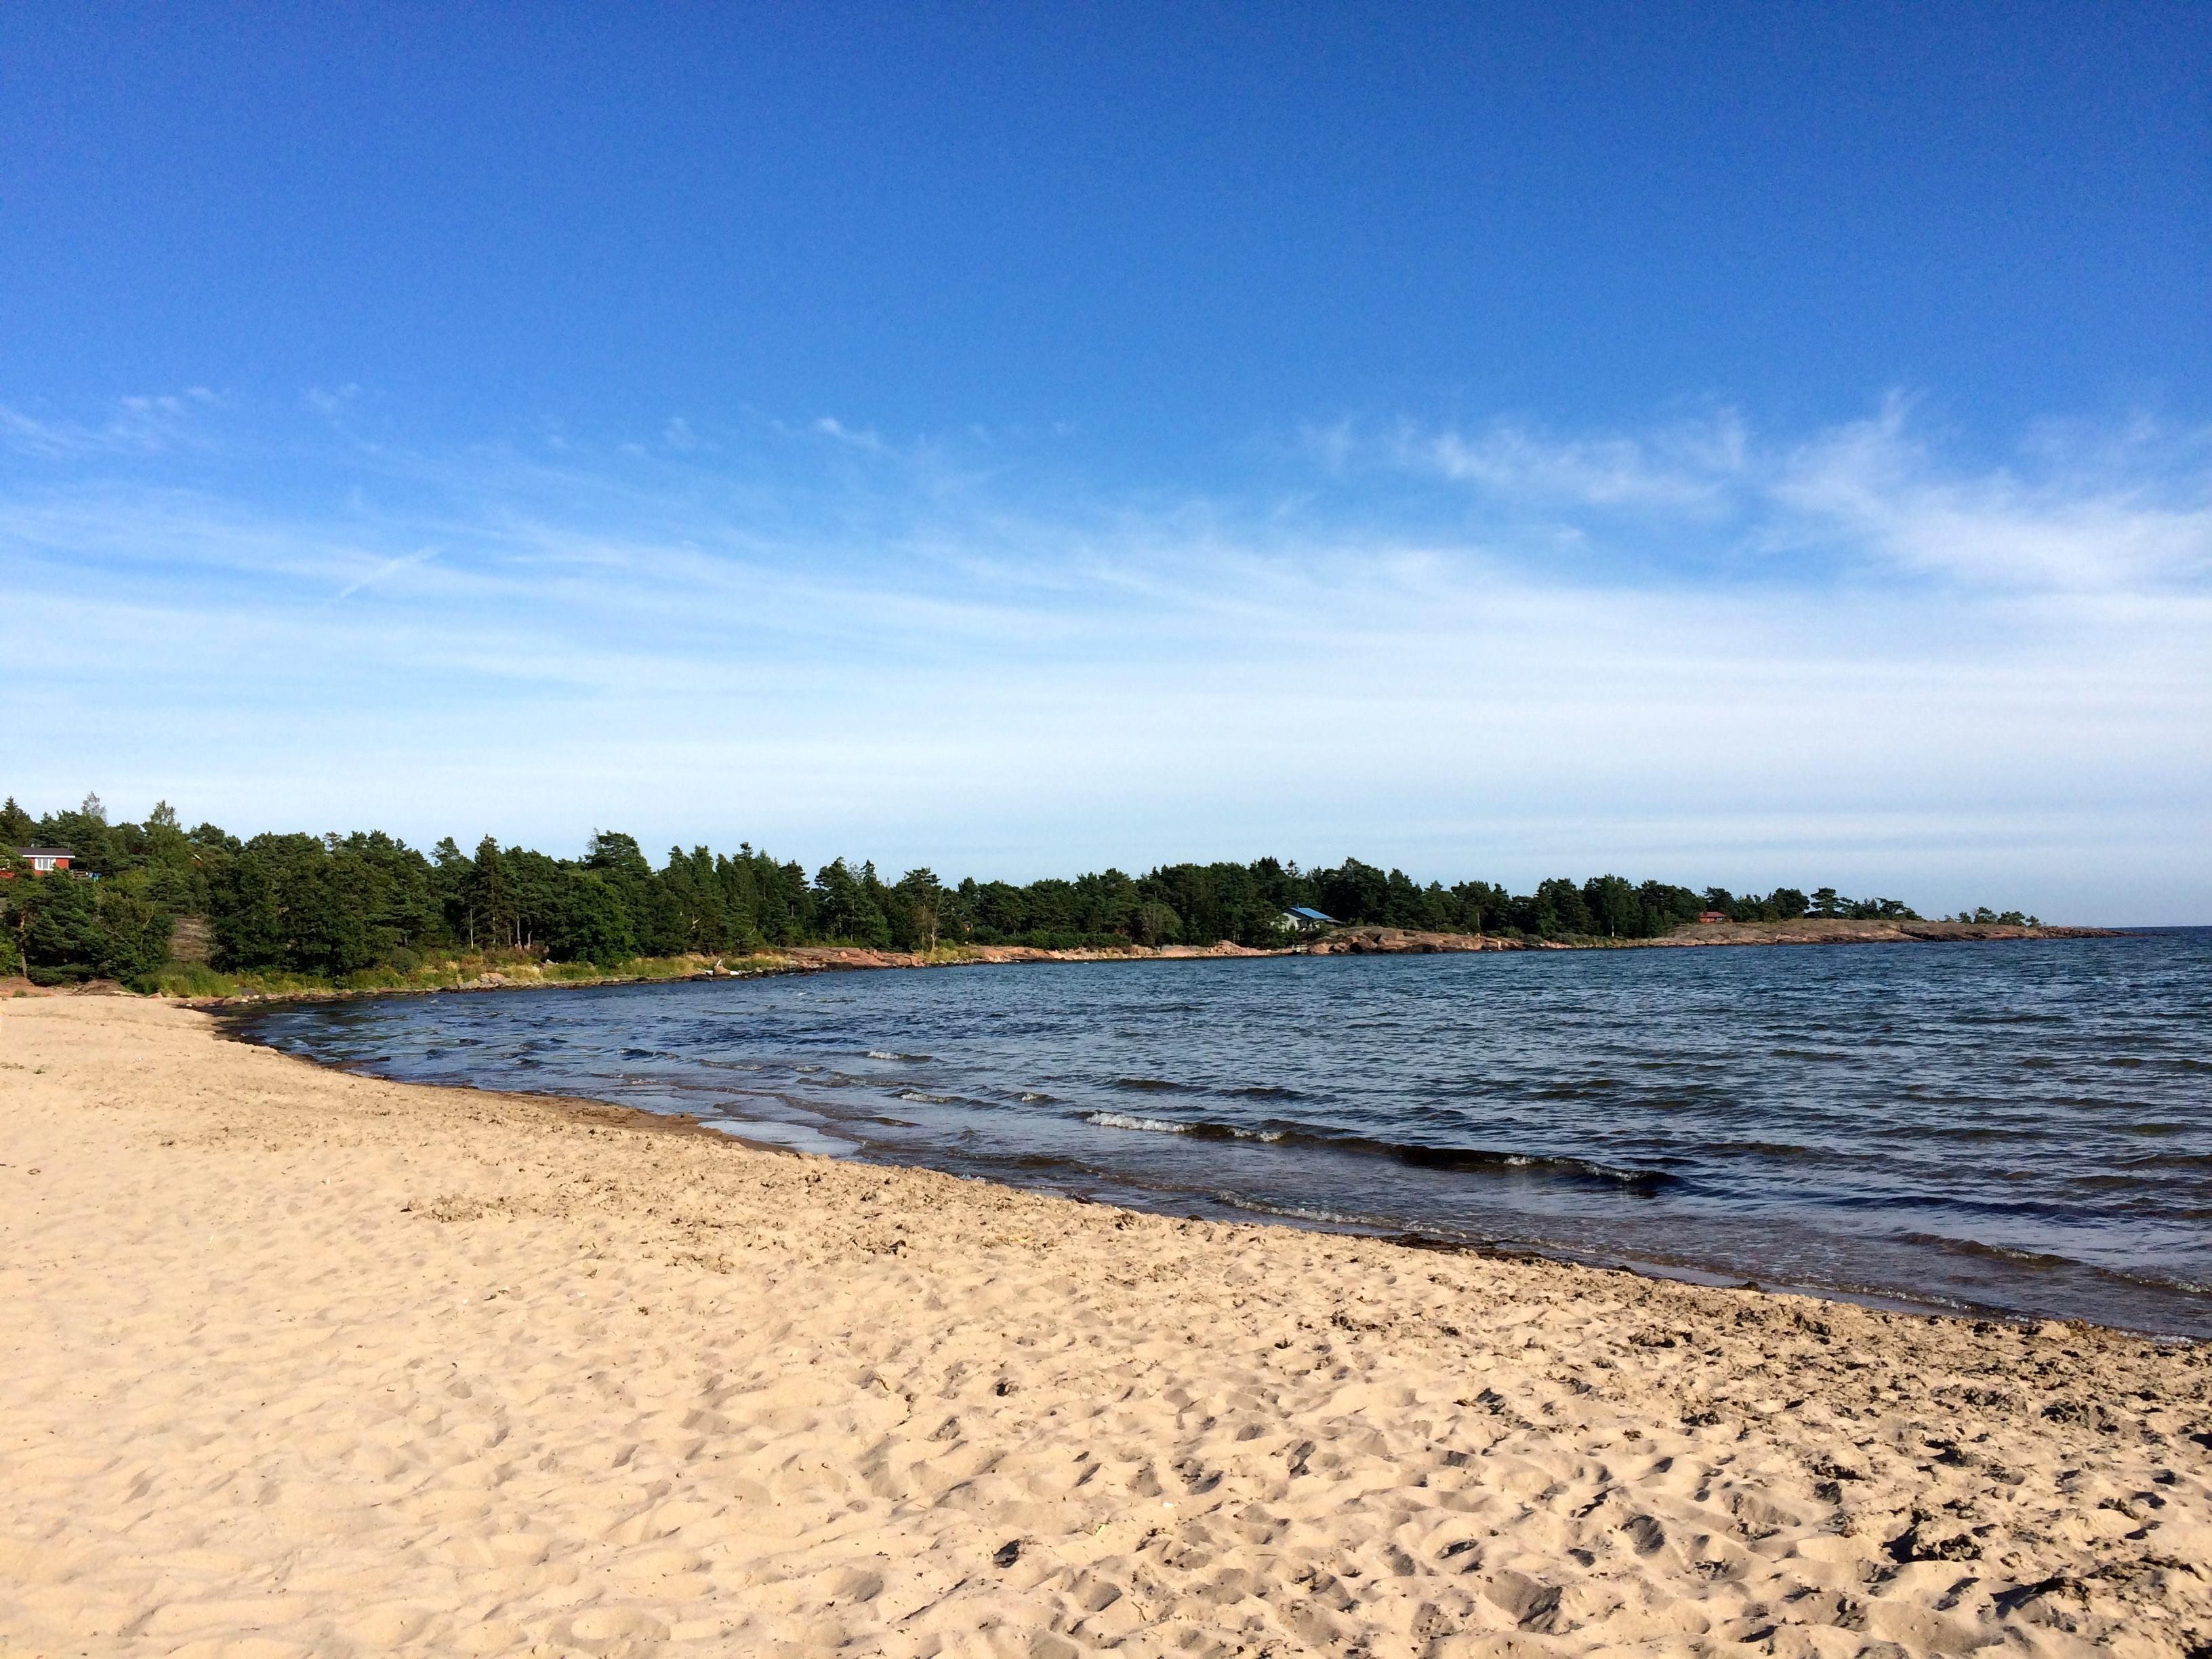 Degersand beach